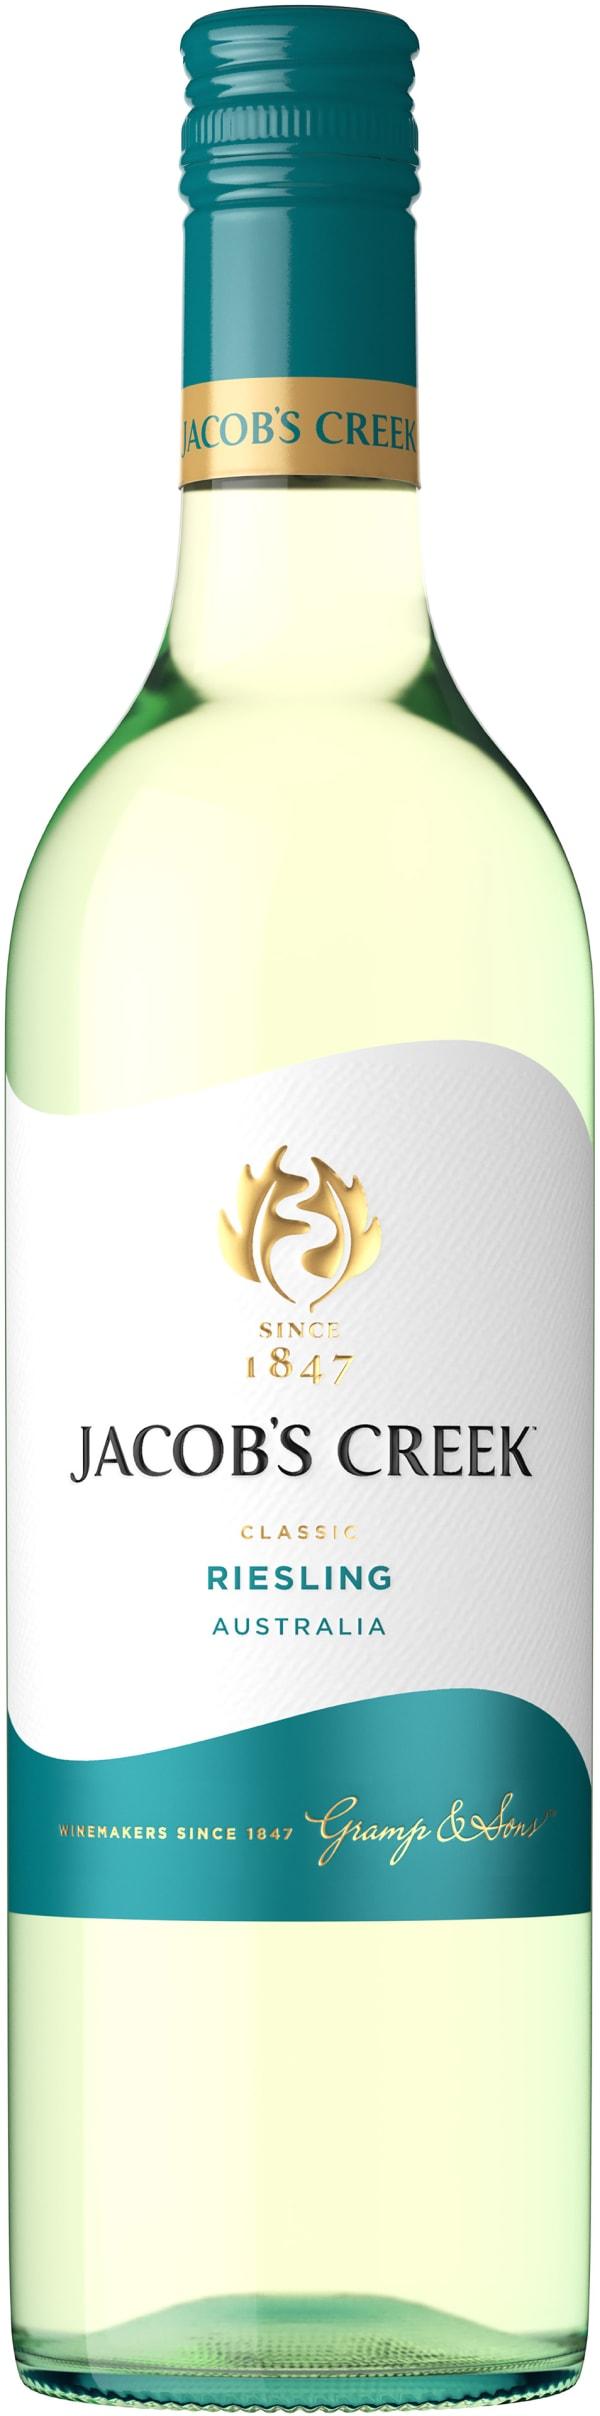 Jacob's Creek Riesling 2019